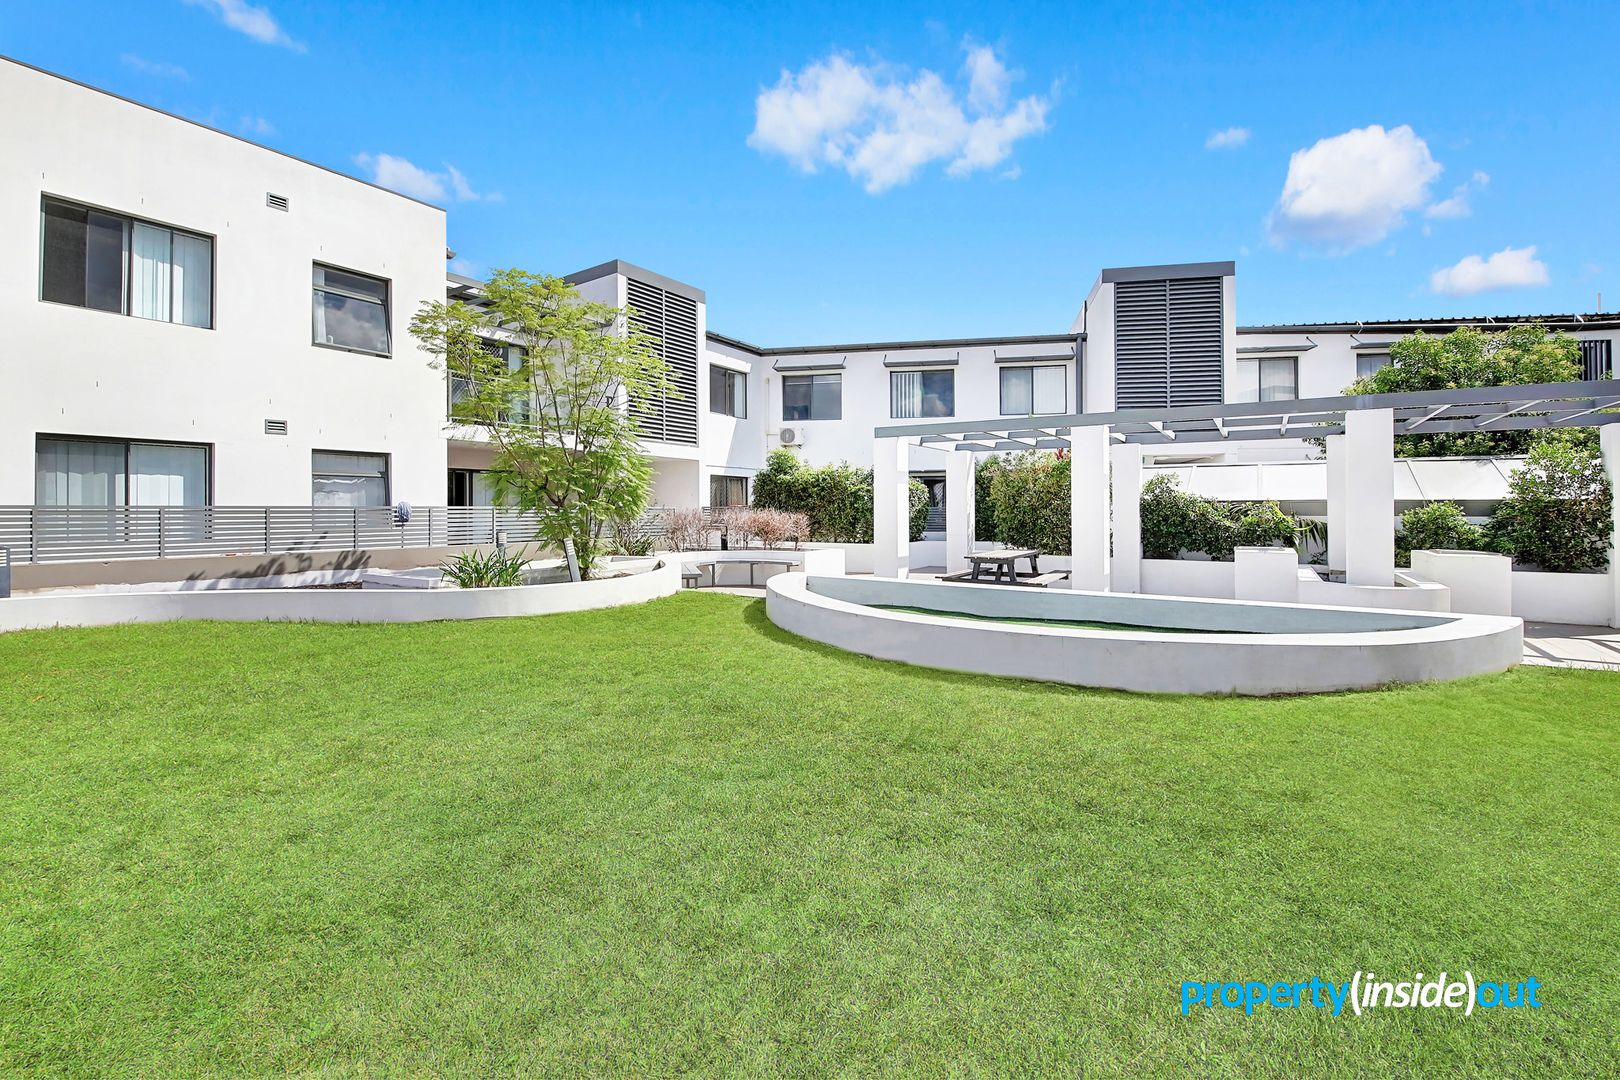 27/465 Wentworth Ave, Toongabbie NSW 2146, Image 2